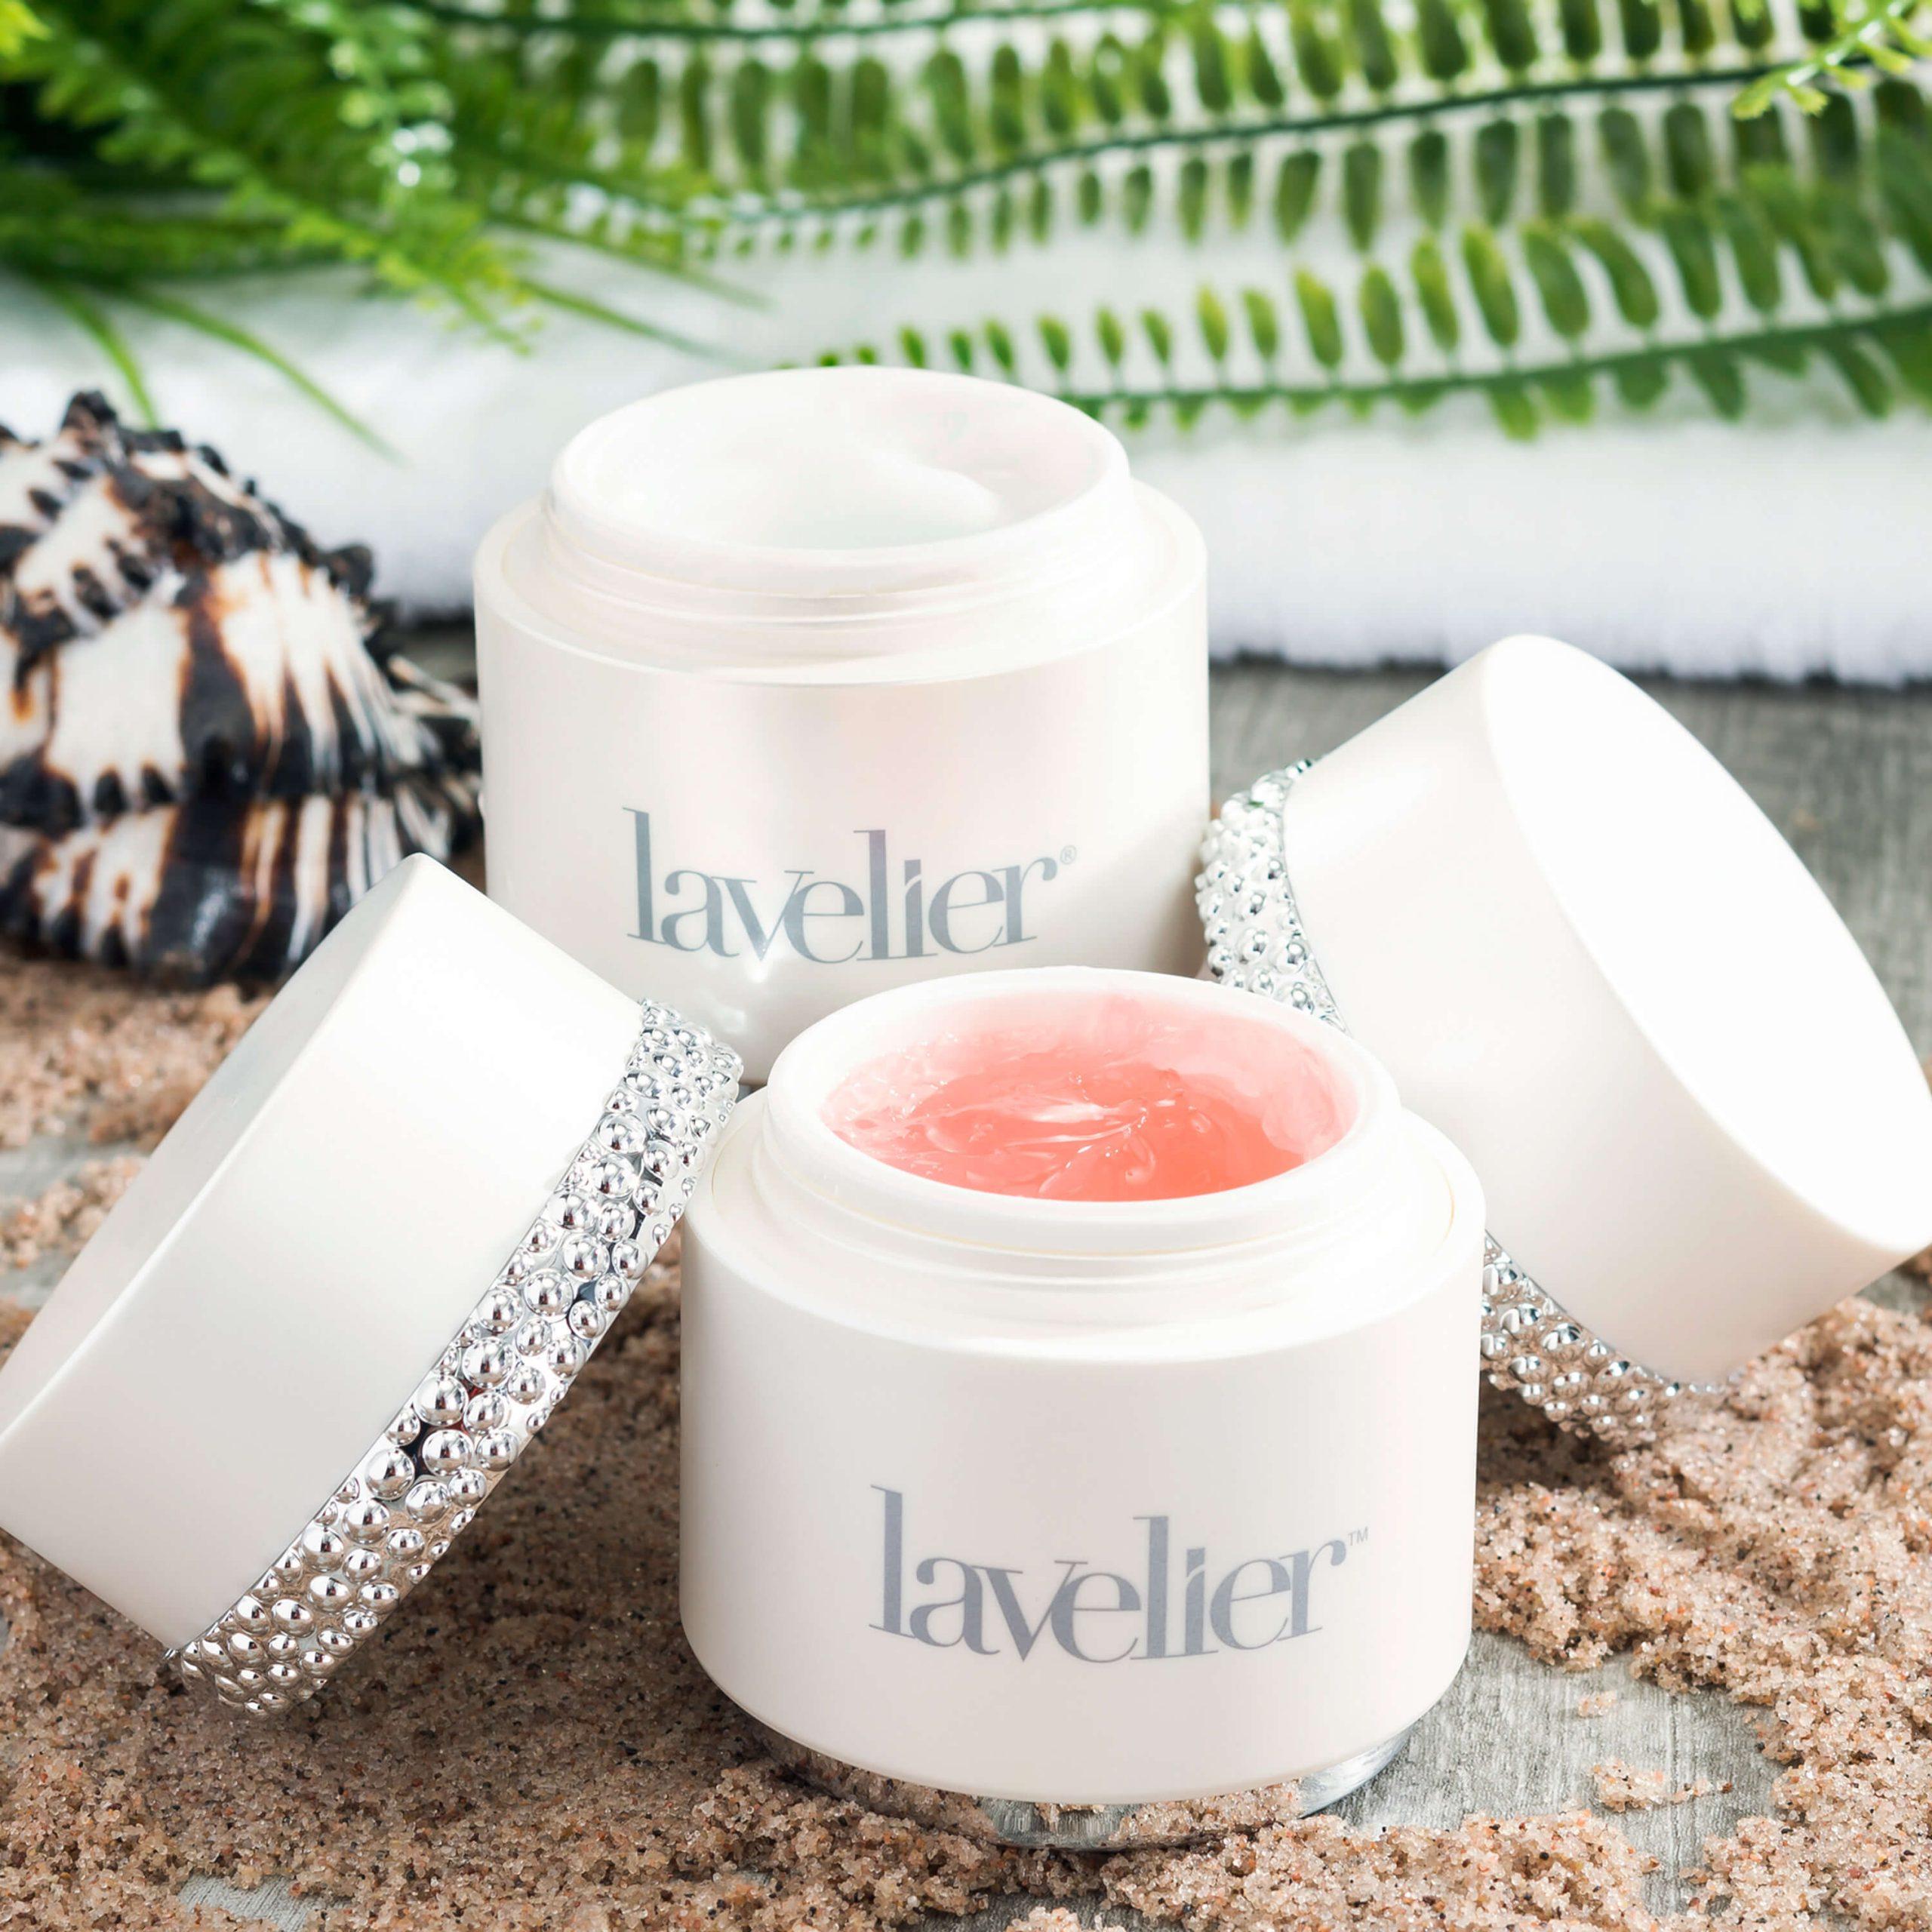 Lavelier Intensive Facial Peel